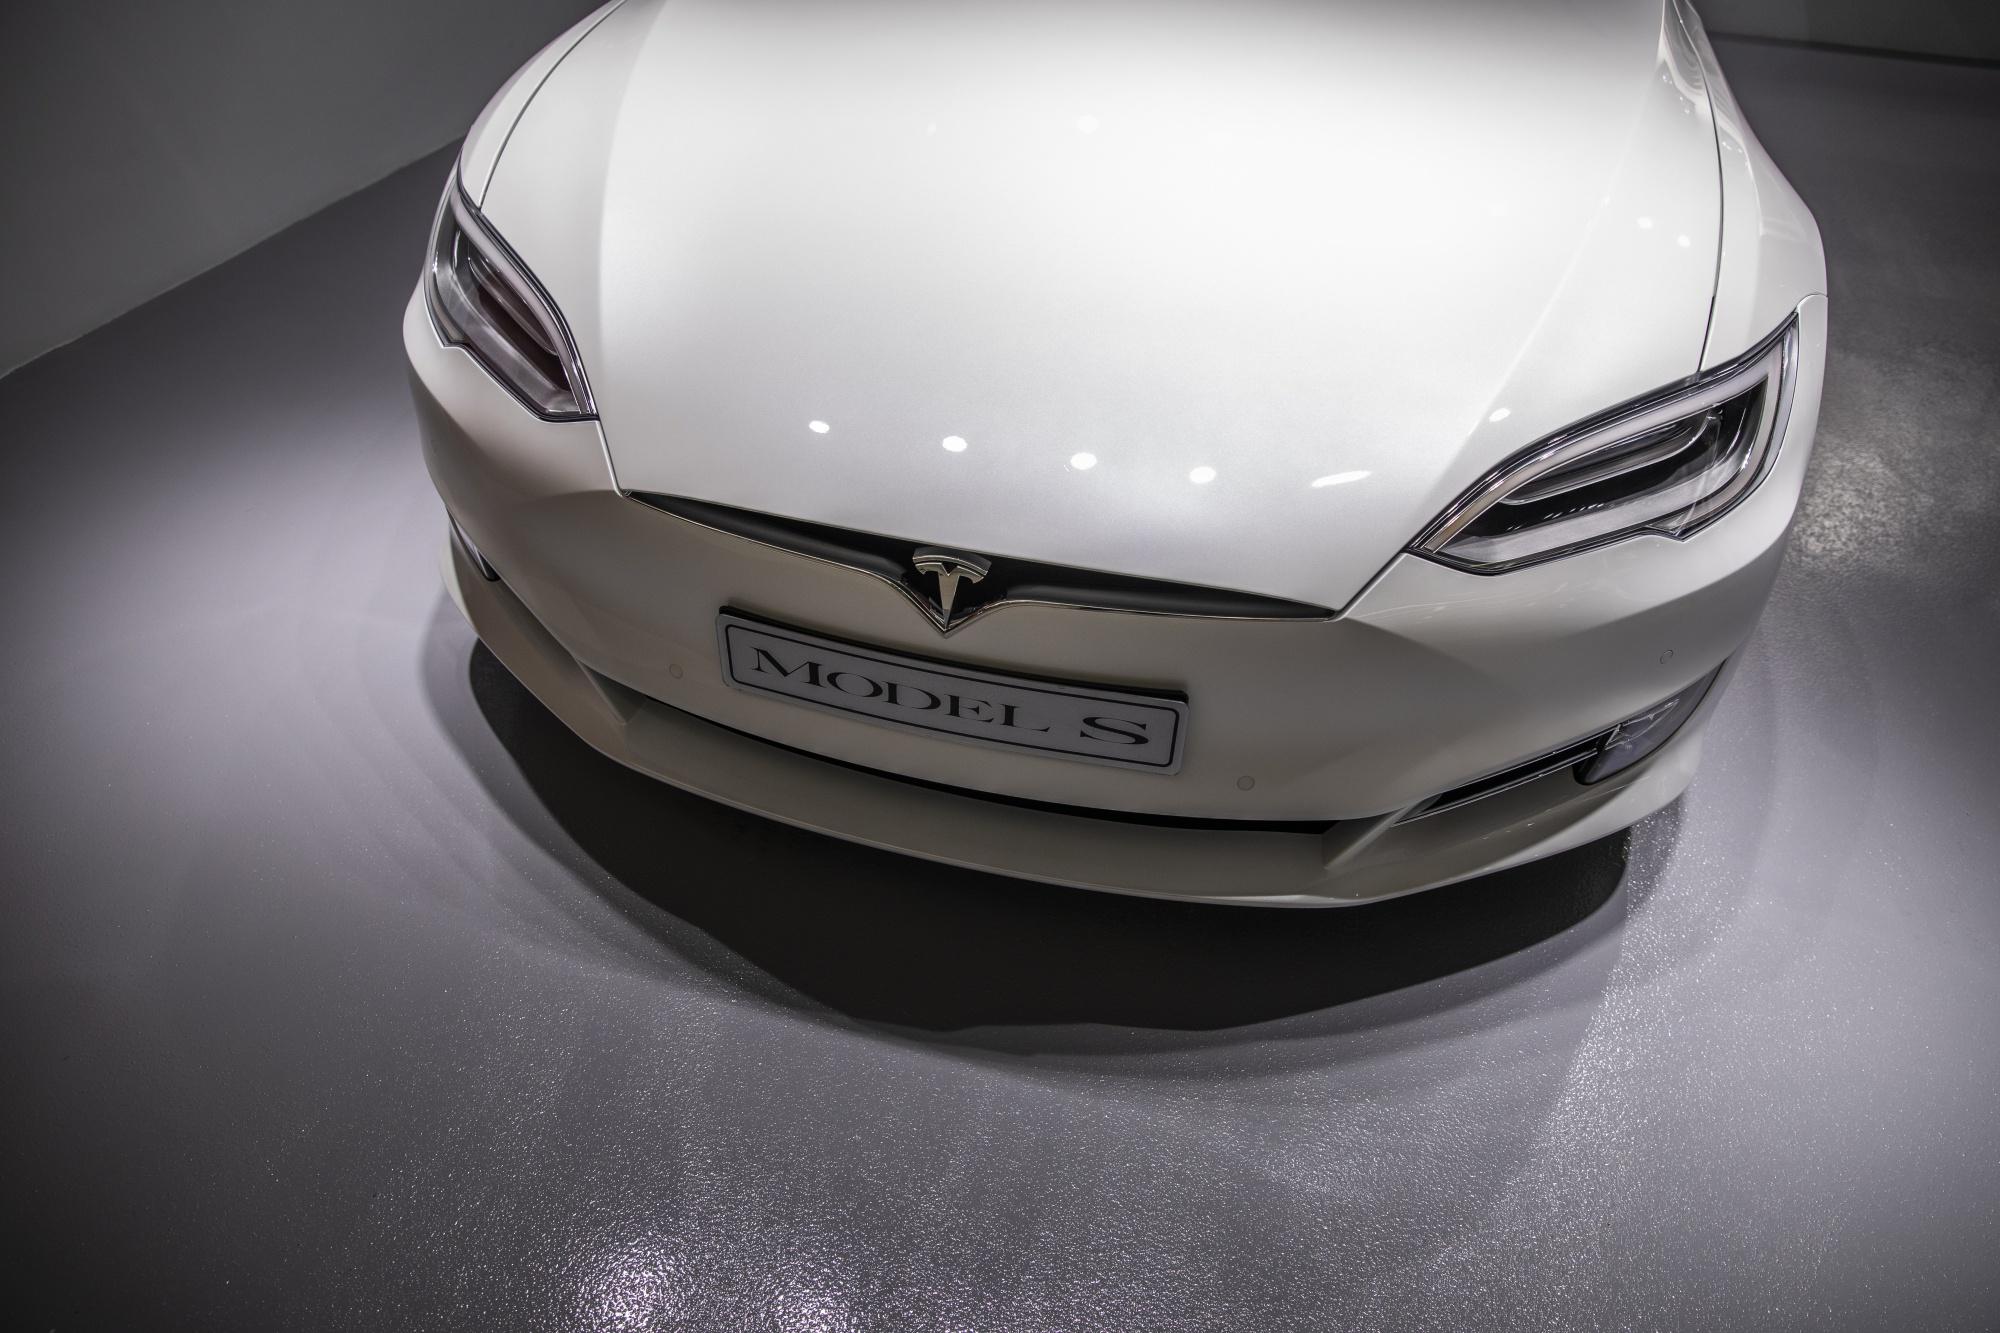 Tesla Advances China Push With 2019 Shanghai Production Goal Bloomberg